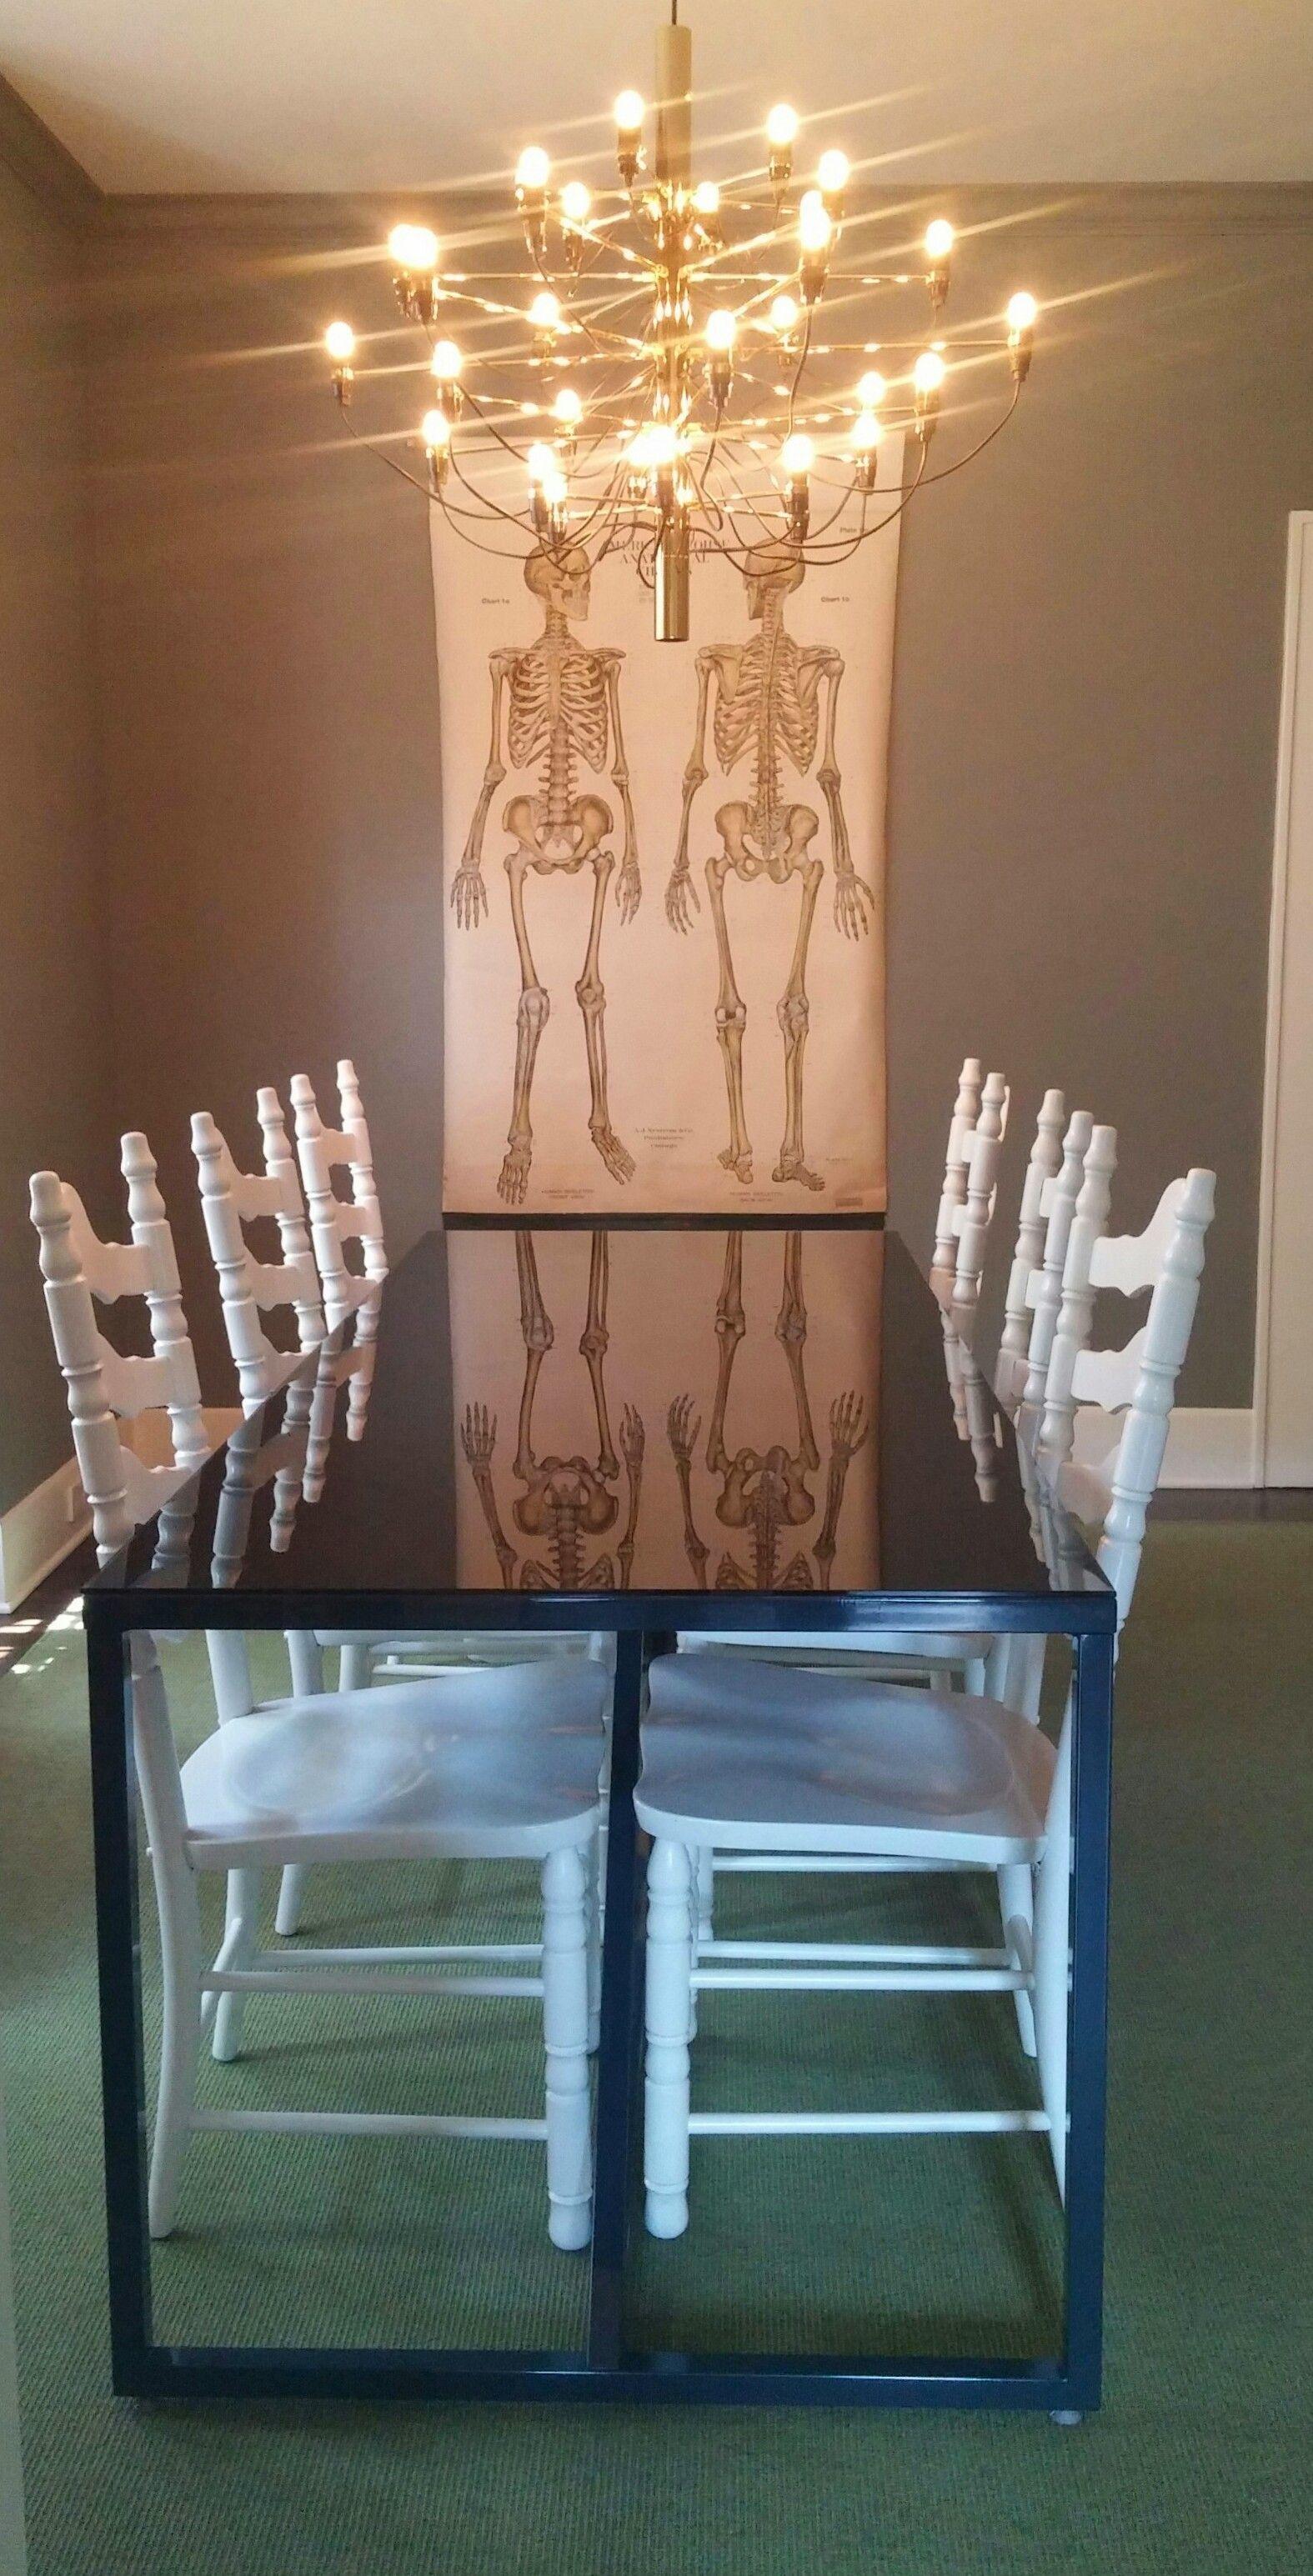 Blu Dot Table, Painted Craigslist Chairs, Mod 2097 Chandelier, Kasthall  Macro Melange Rug